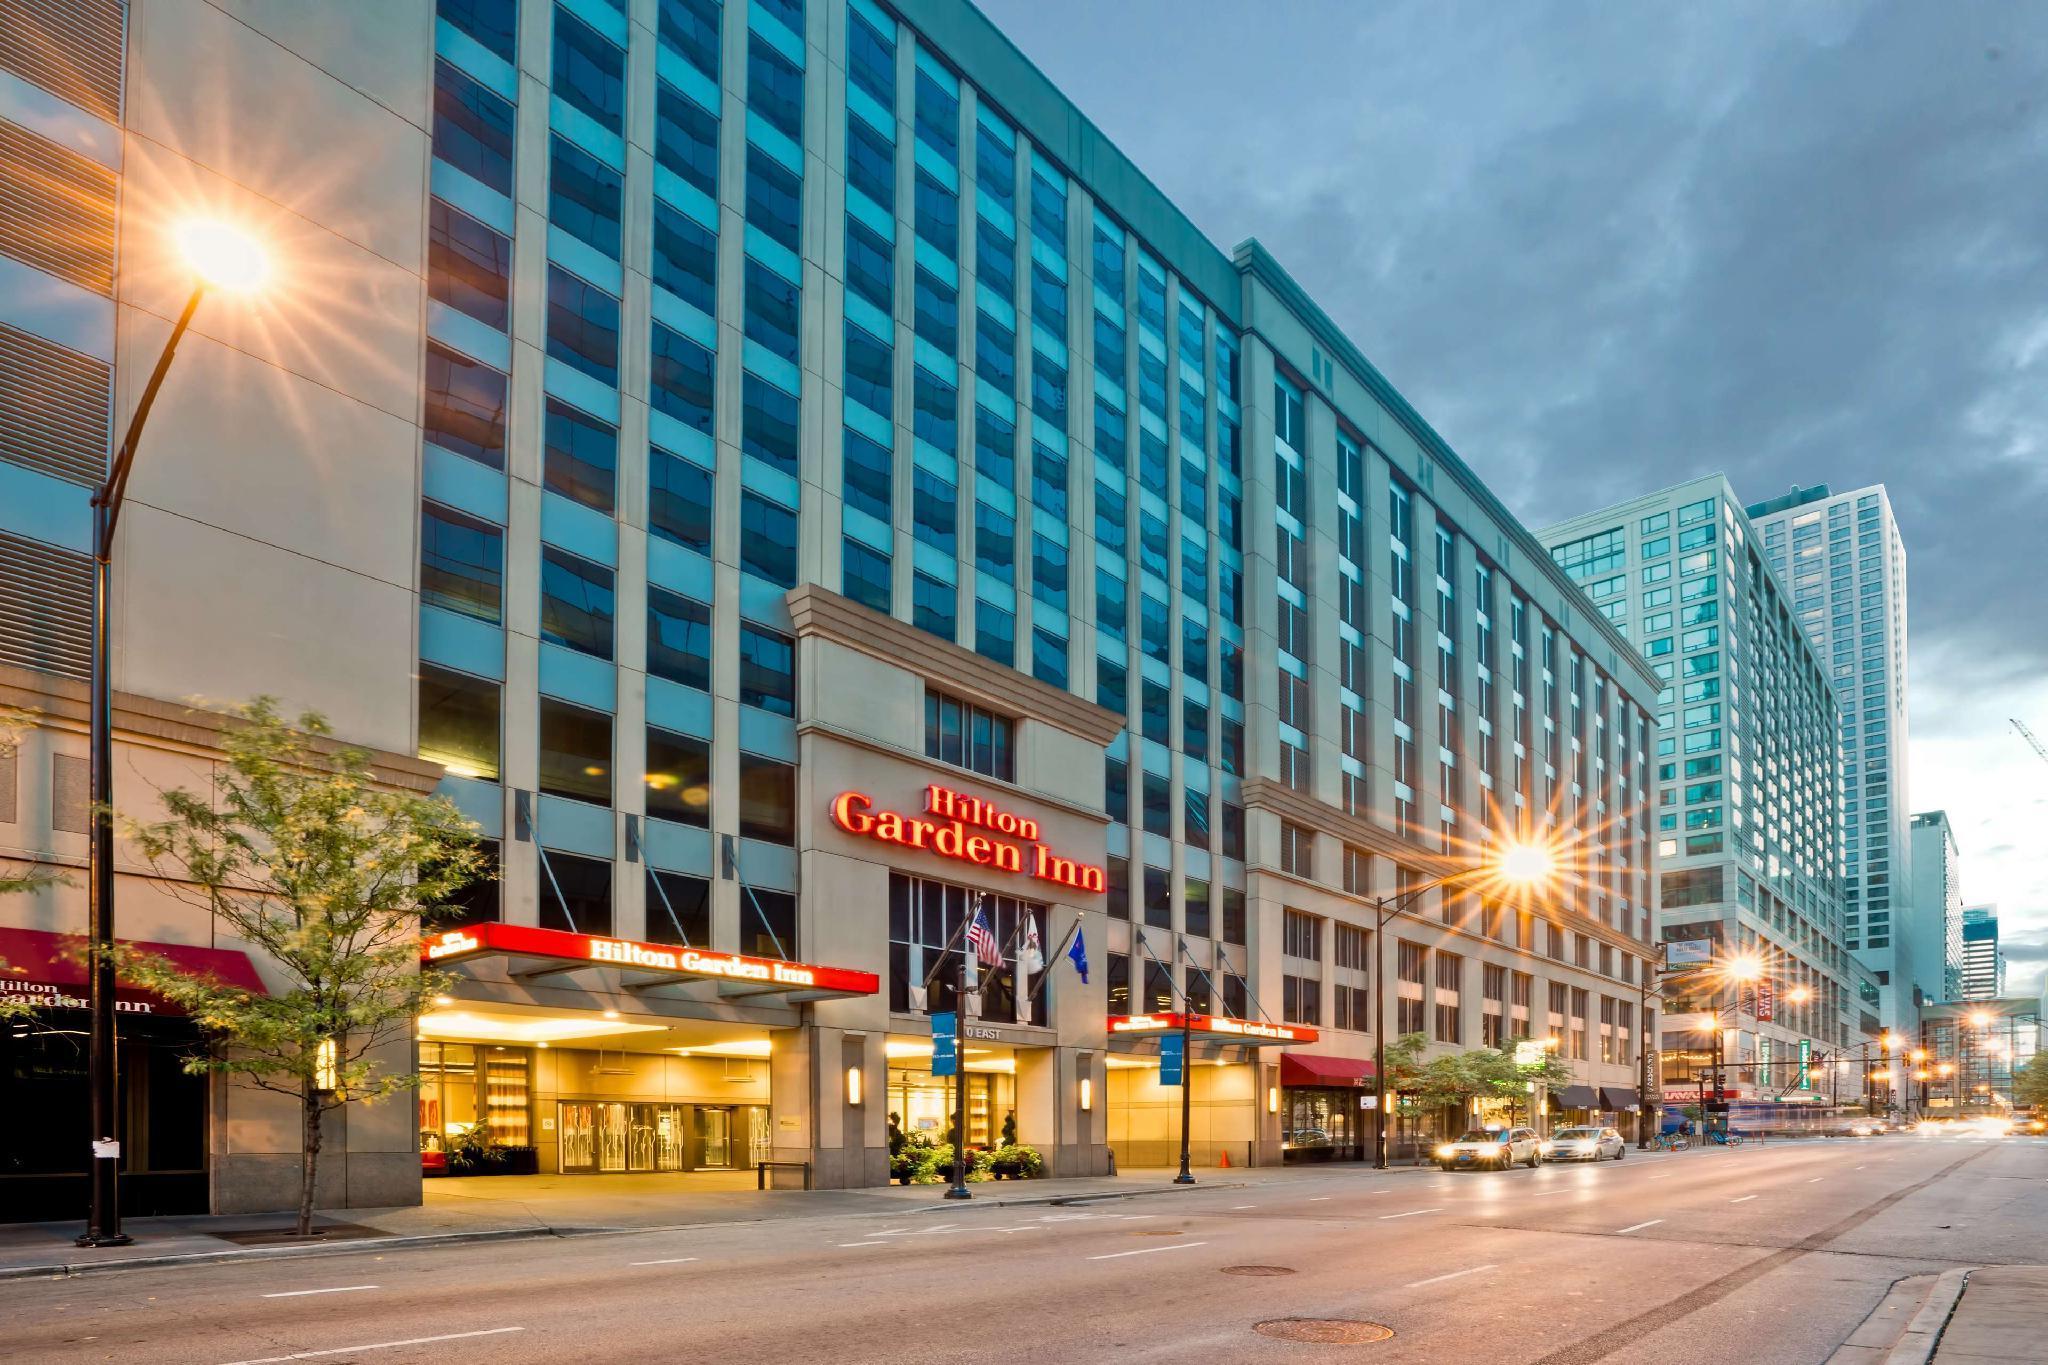 Hilton Garden Inn Chicago Downtown Magnificent Mile image